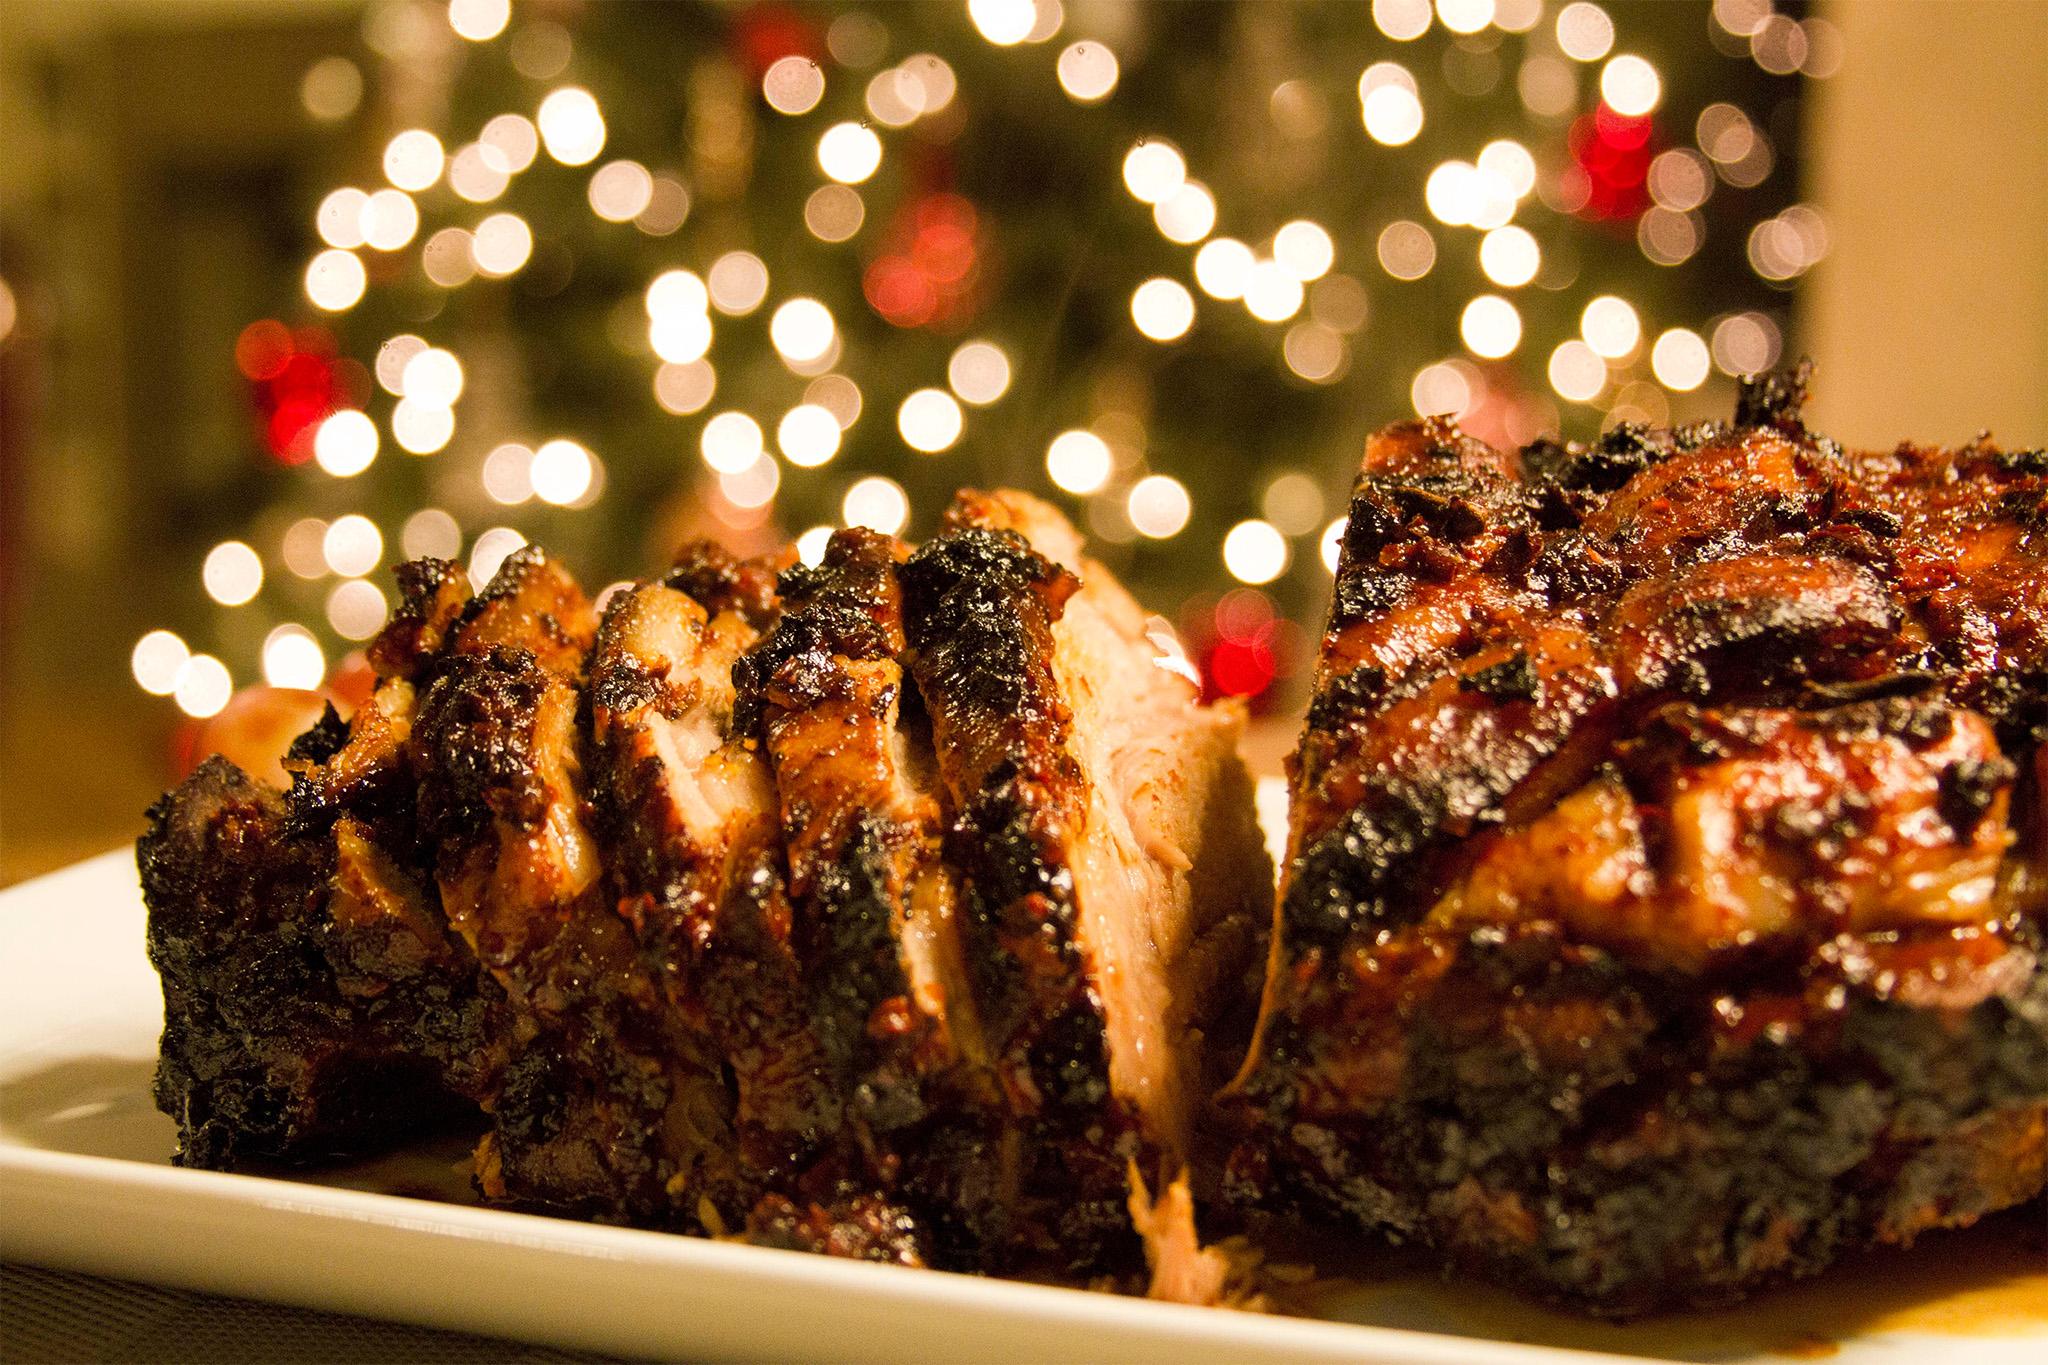 Cenas navide as o fin de a o carnes chefscarnes chefs - Comida para navidad facil ...